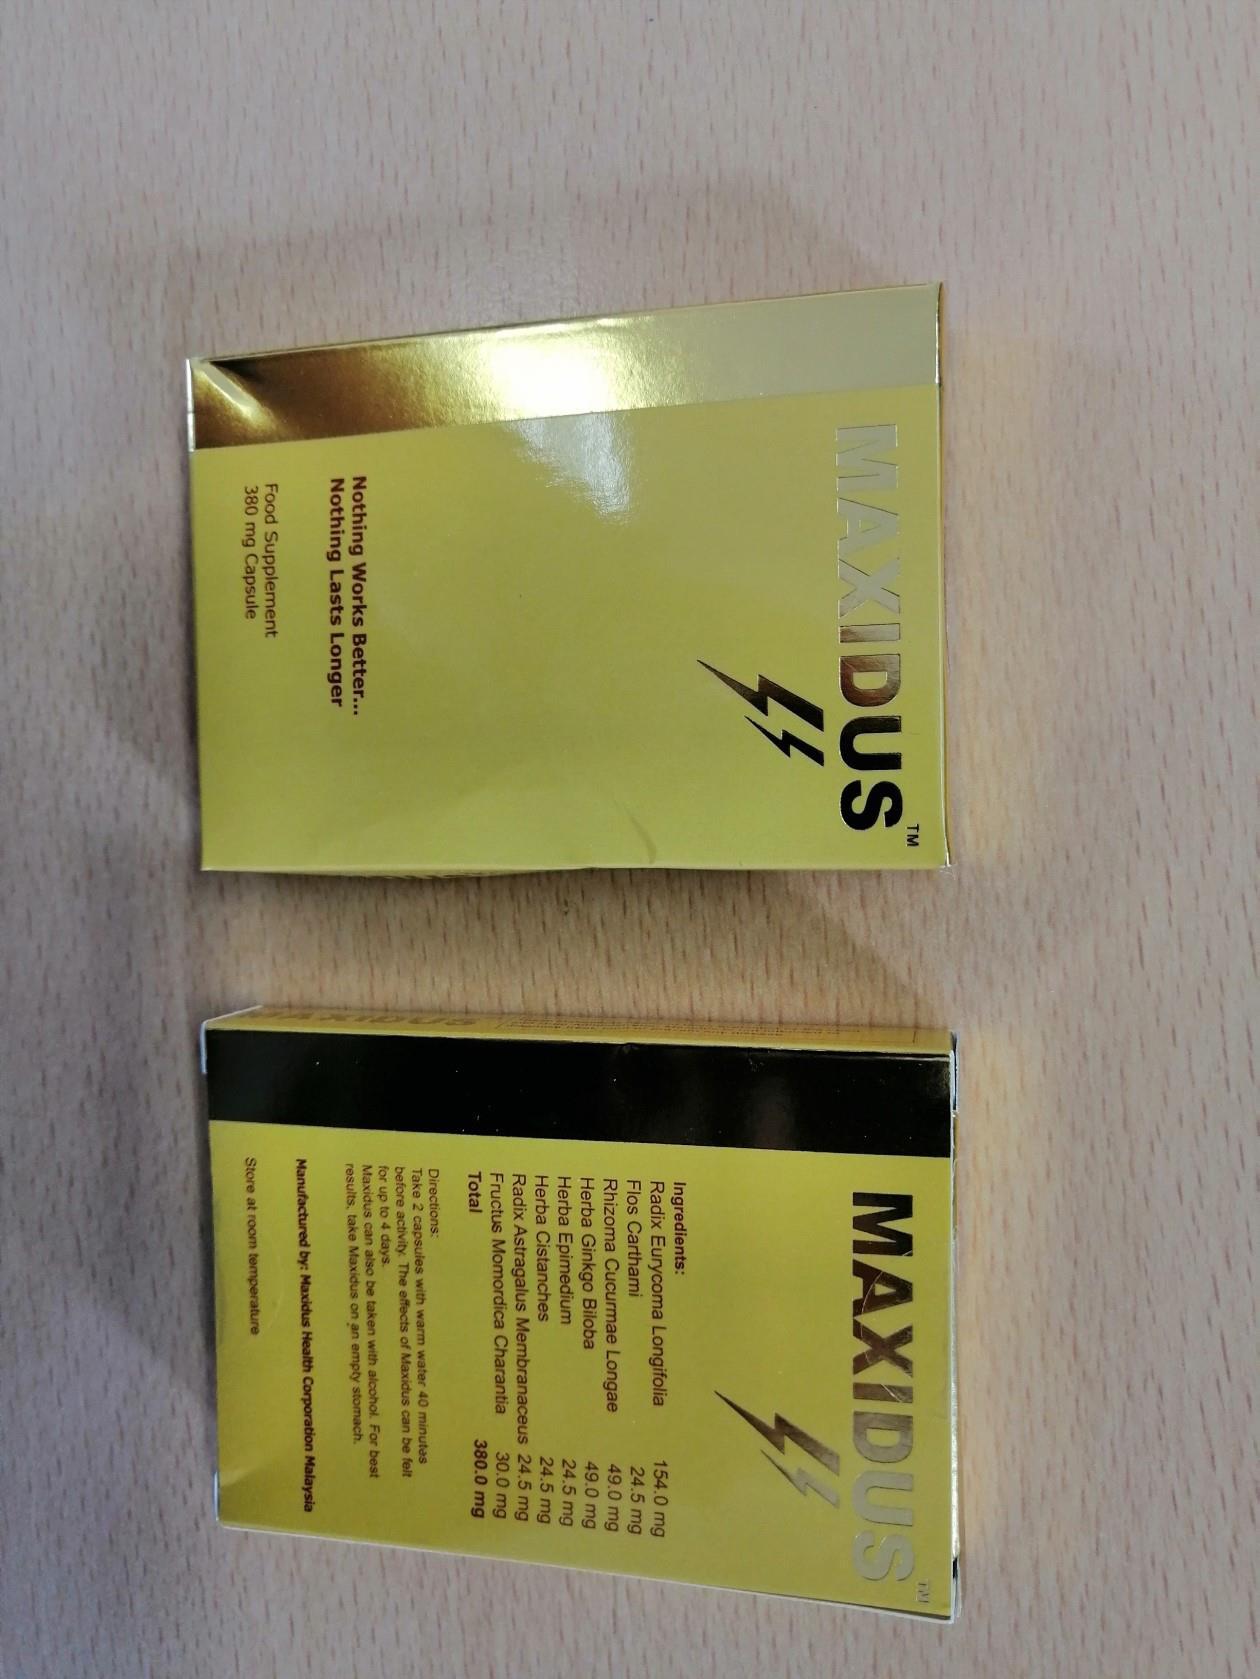 Image of the illigal product: Maxidus Capsules